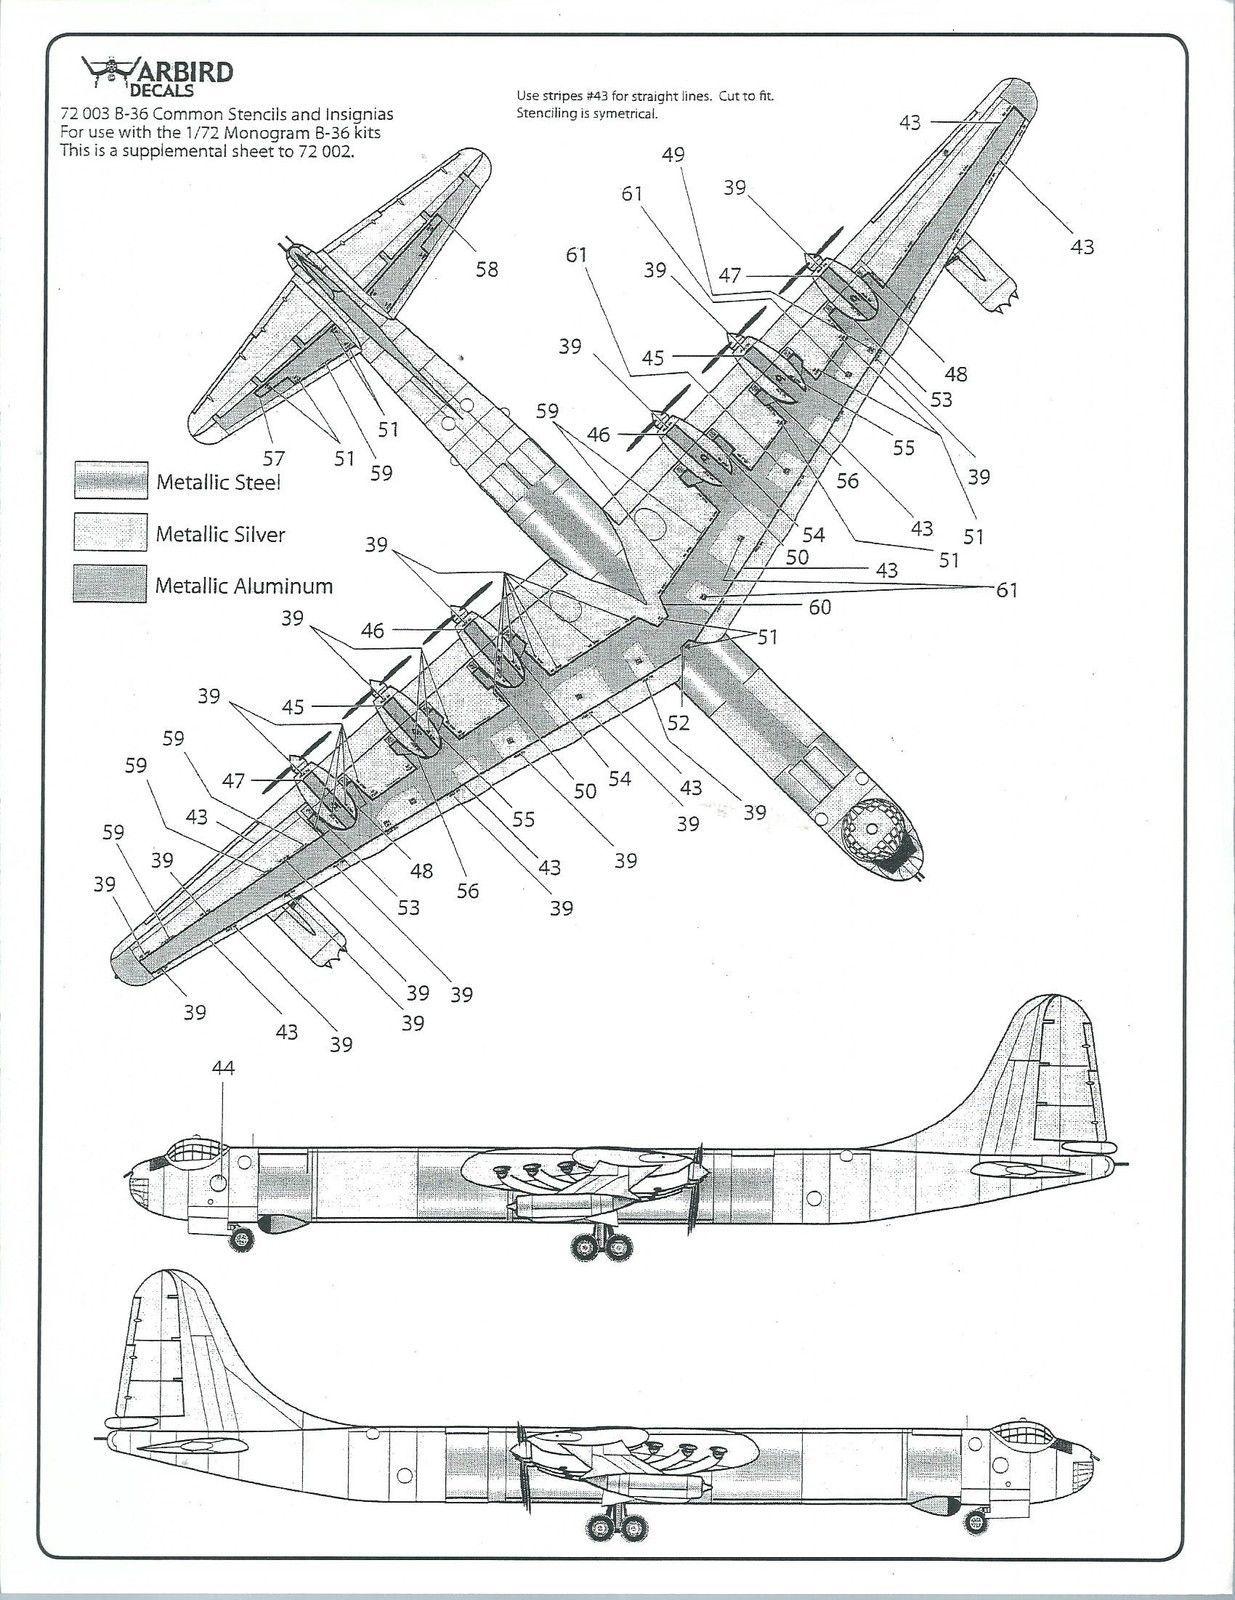 Warbird B-36 Peacemaker Walkway, Stencil, Data, Common Marking ...